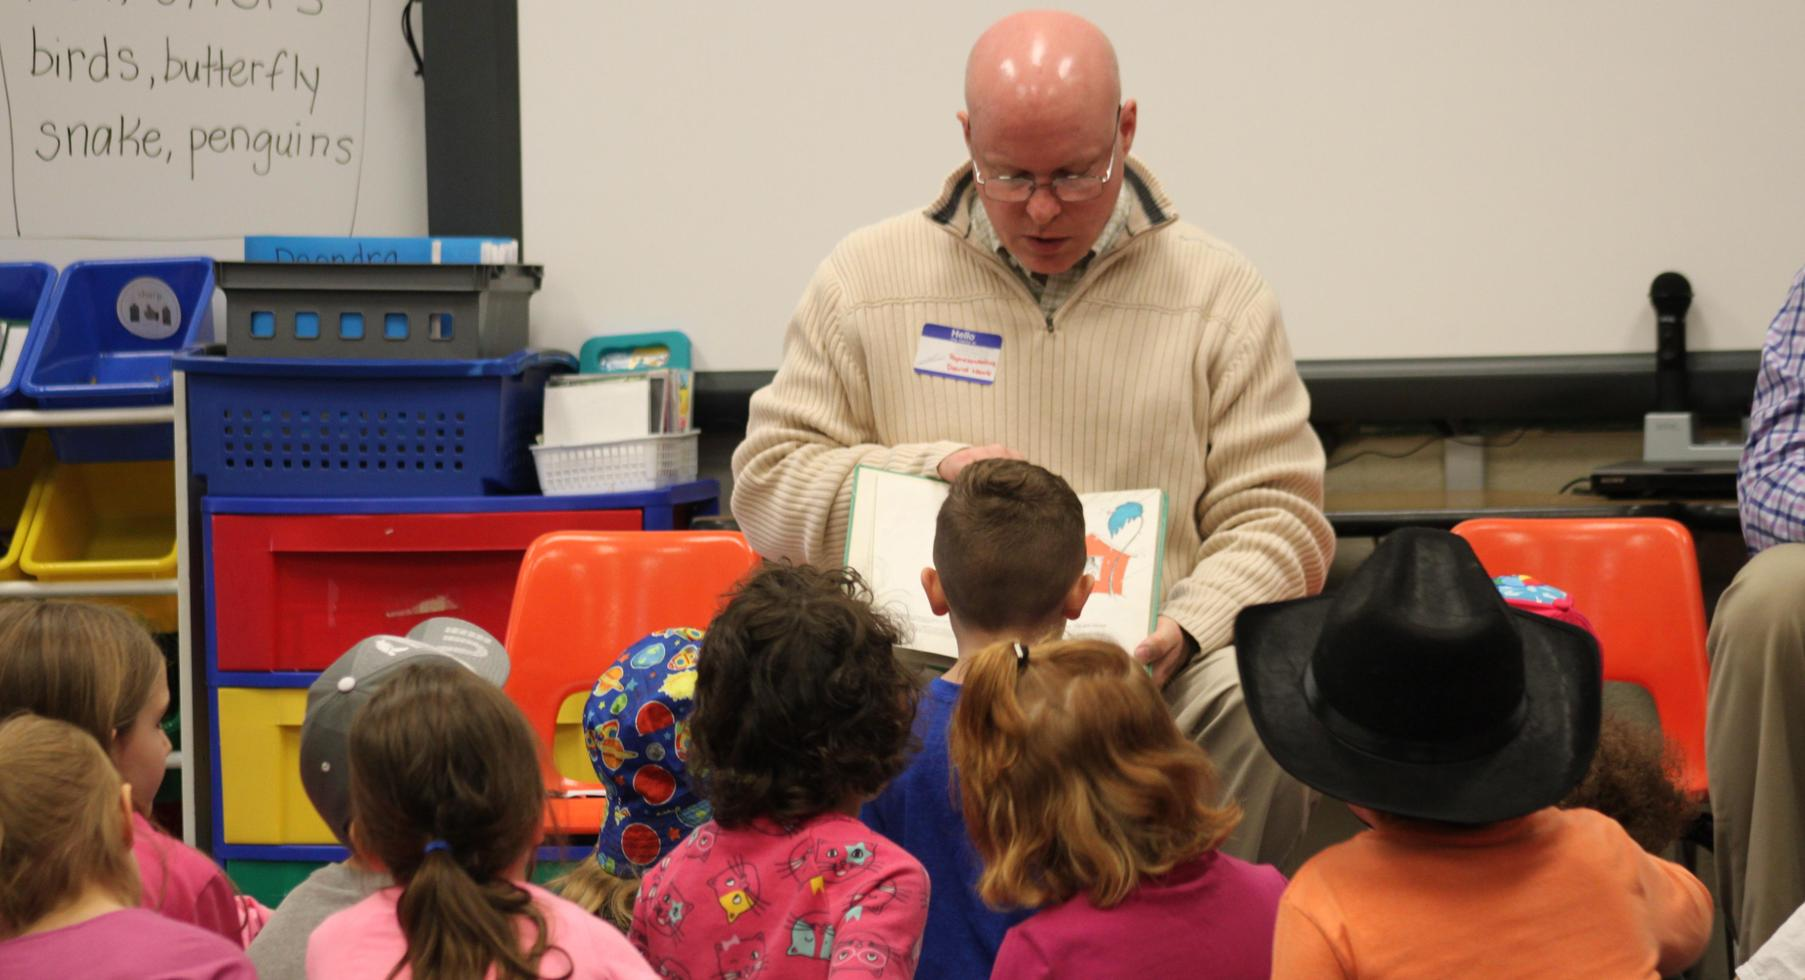 Representative Hawk reads to students.